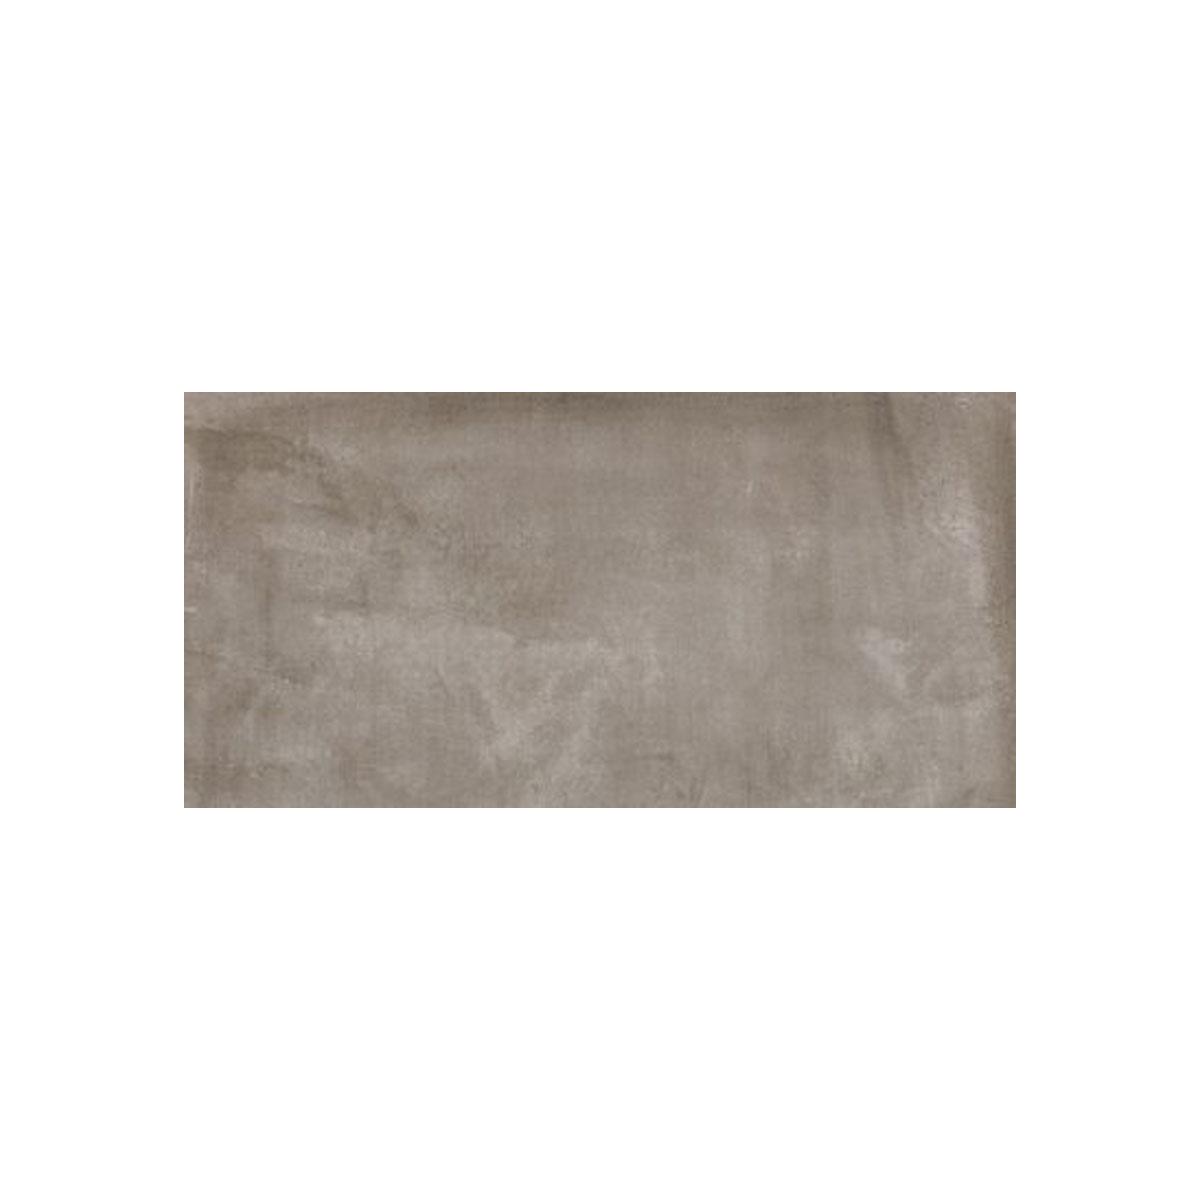 Basic Concrete - Dark Grey - 300x600mm - Concrete Look Tiles - Stone3 Brisbane